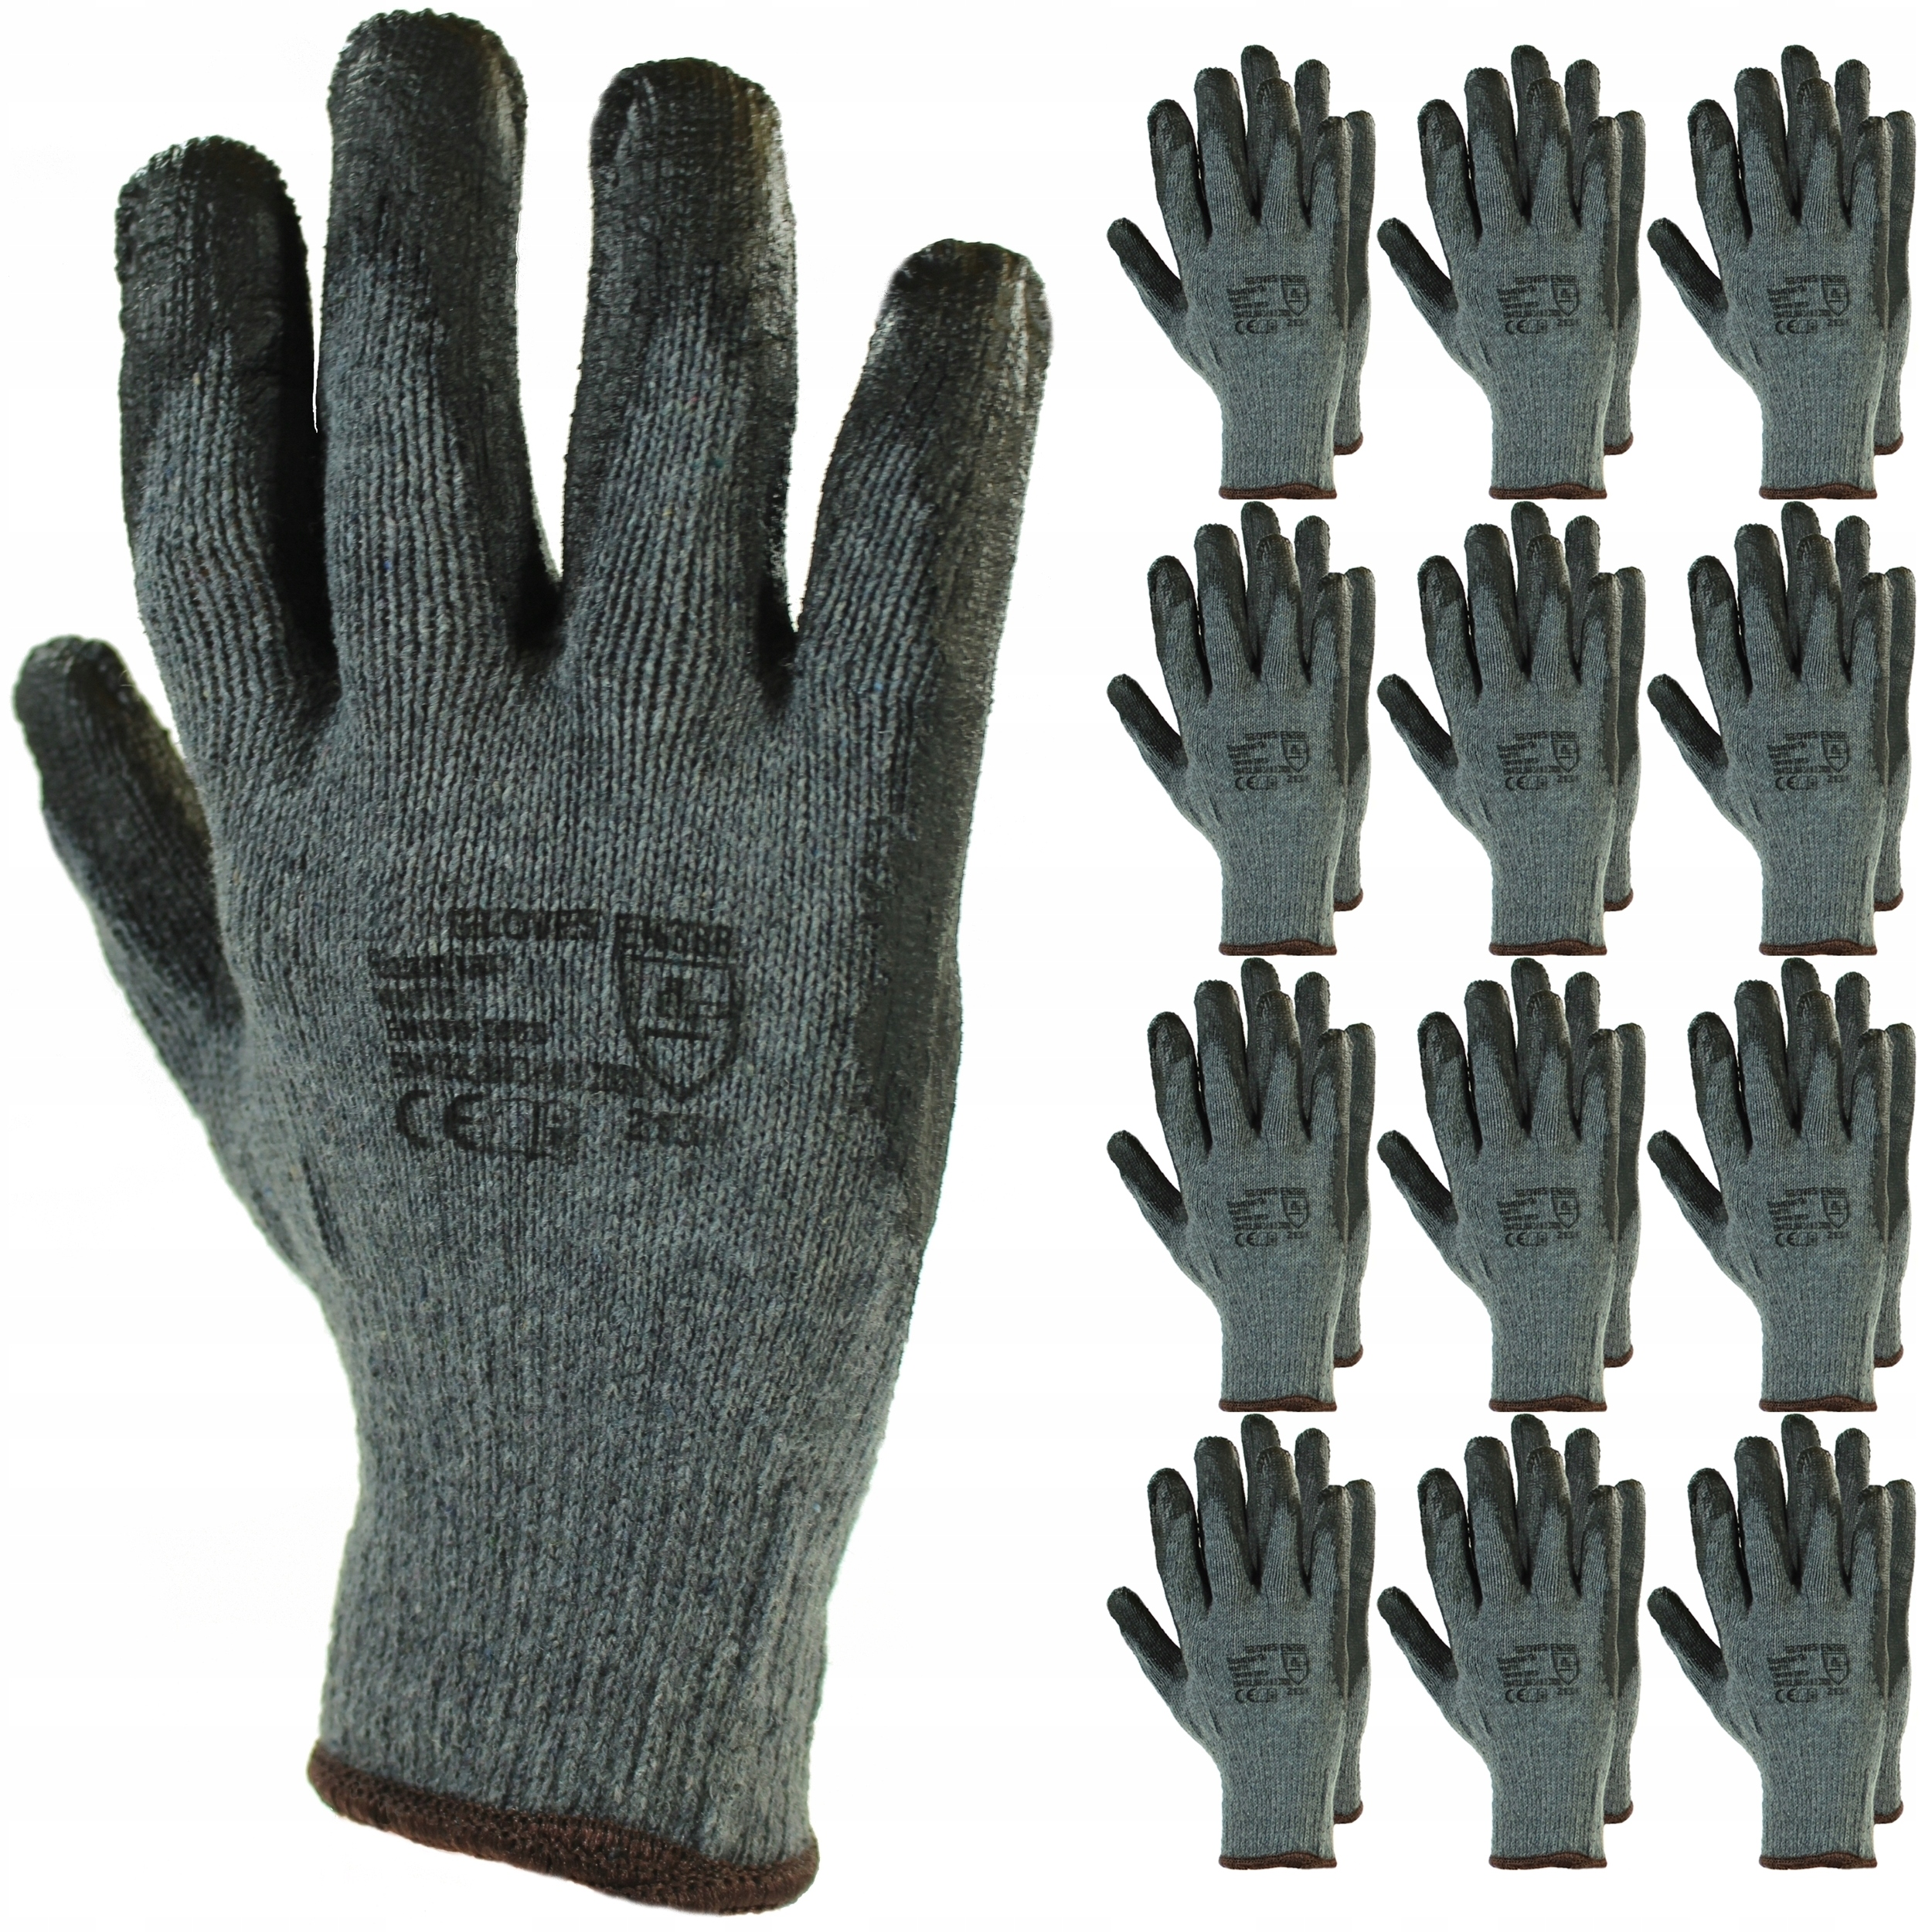 12 пар ПЕРЧАТК, рабочие перчатки.10 ПЕРЧАТК